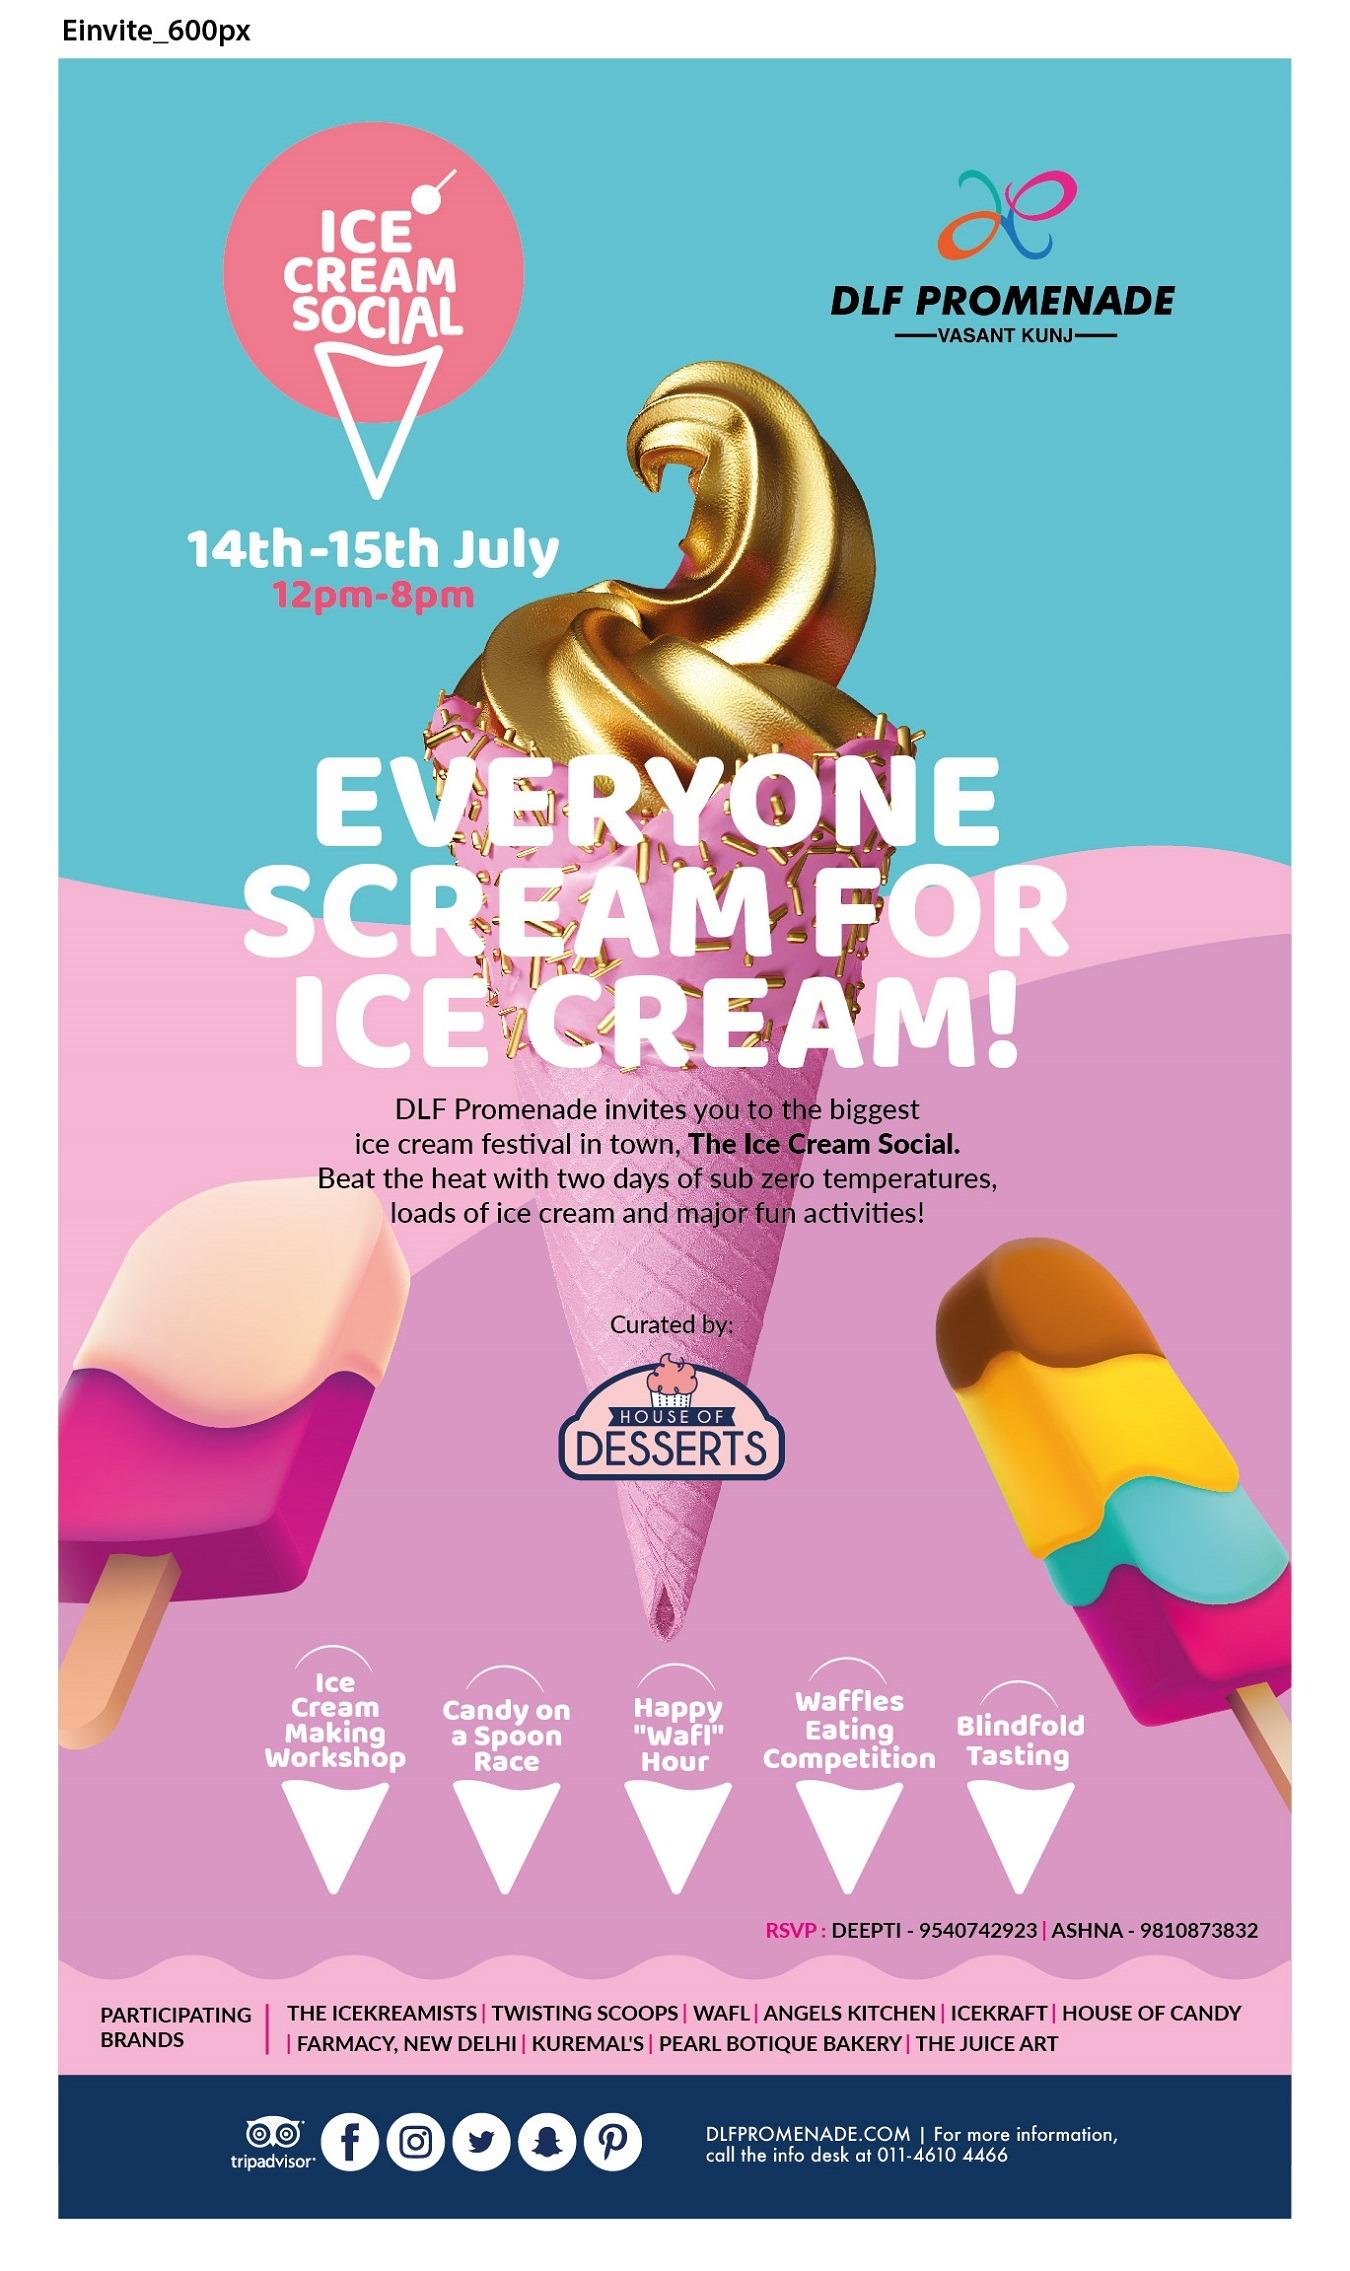 DLF Promenade presents Ice Cream Social Tickets by ASHNA